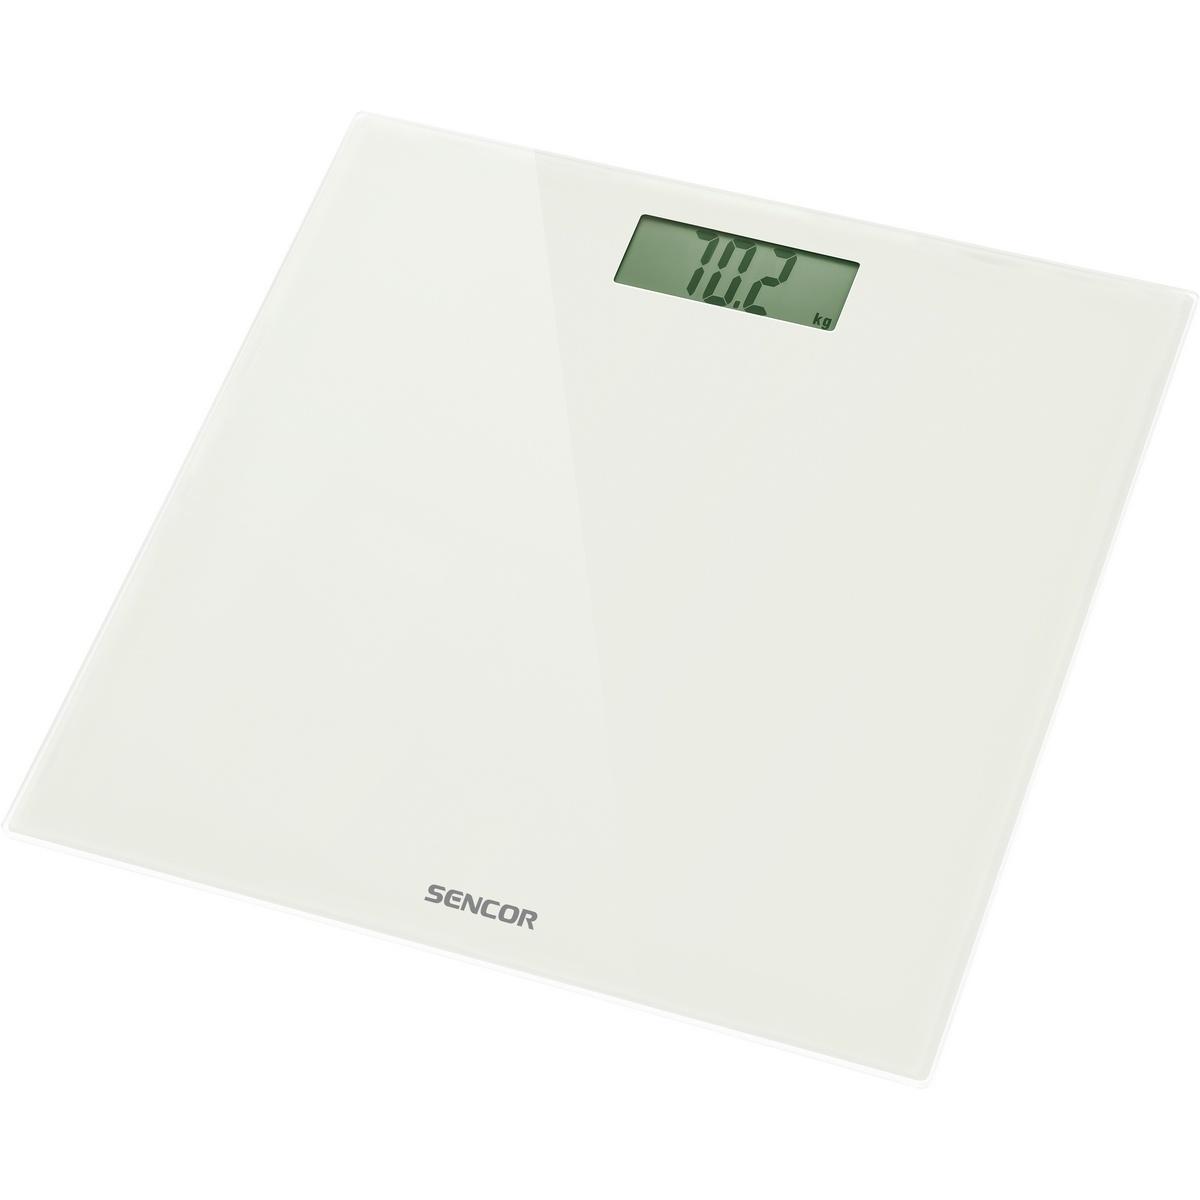 Sencor SBS 2301WH waga osobowa